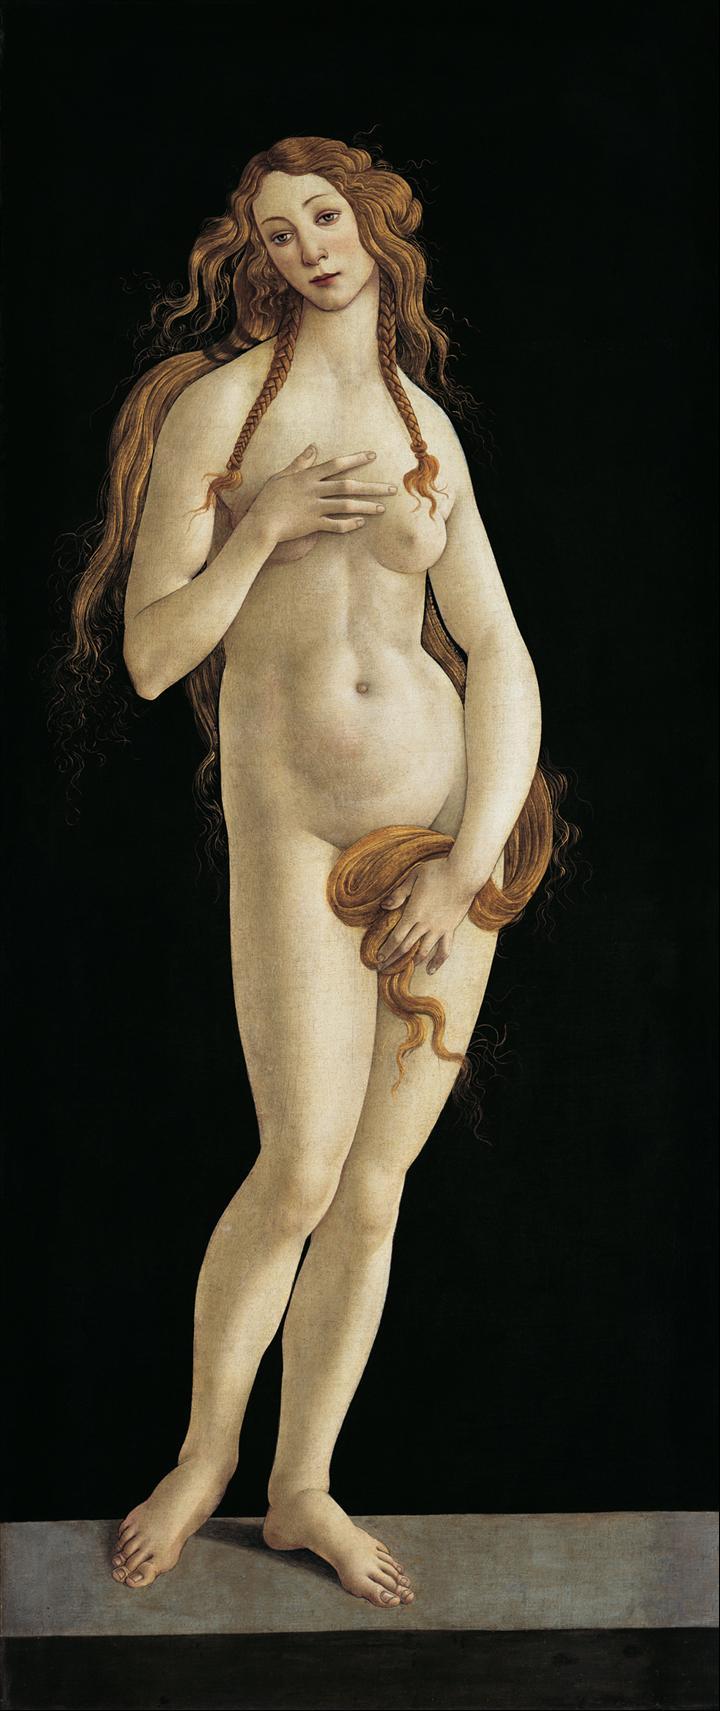 http://1.bp.blogspot.com/-aoiItL5ZmHk/T9lfwr9z8AI/AAAAAAAABjg/xyUMXXEXlew/s0/20091124_Botticelli_Nascita_Venere_dettaglio,+Venere+1482.jpg